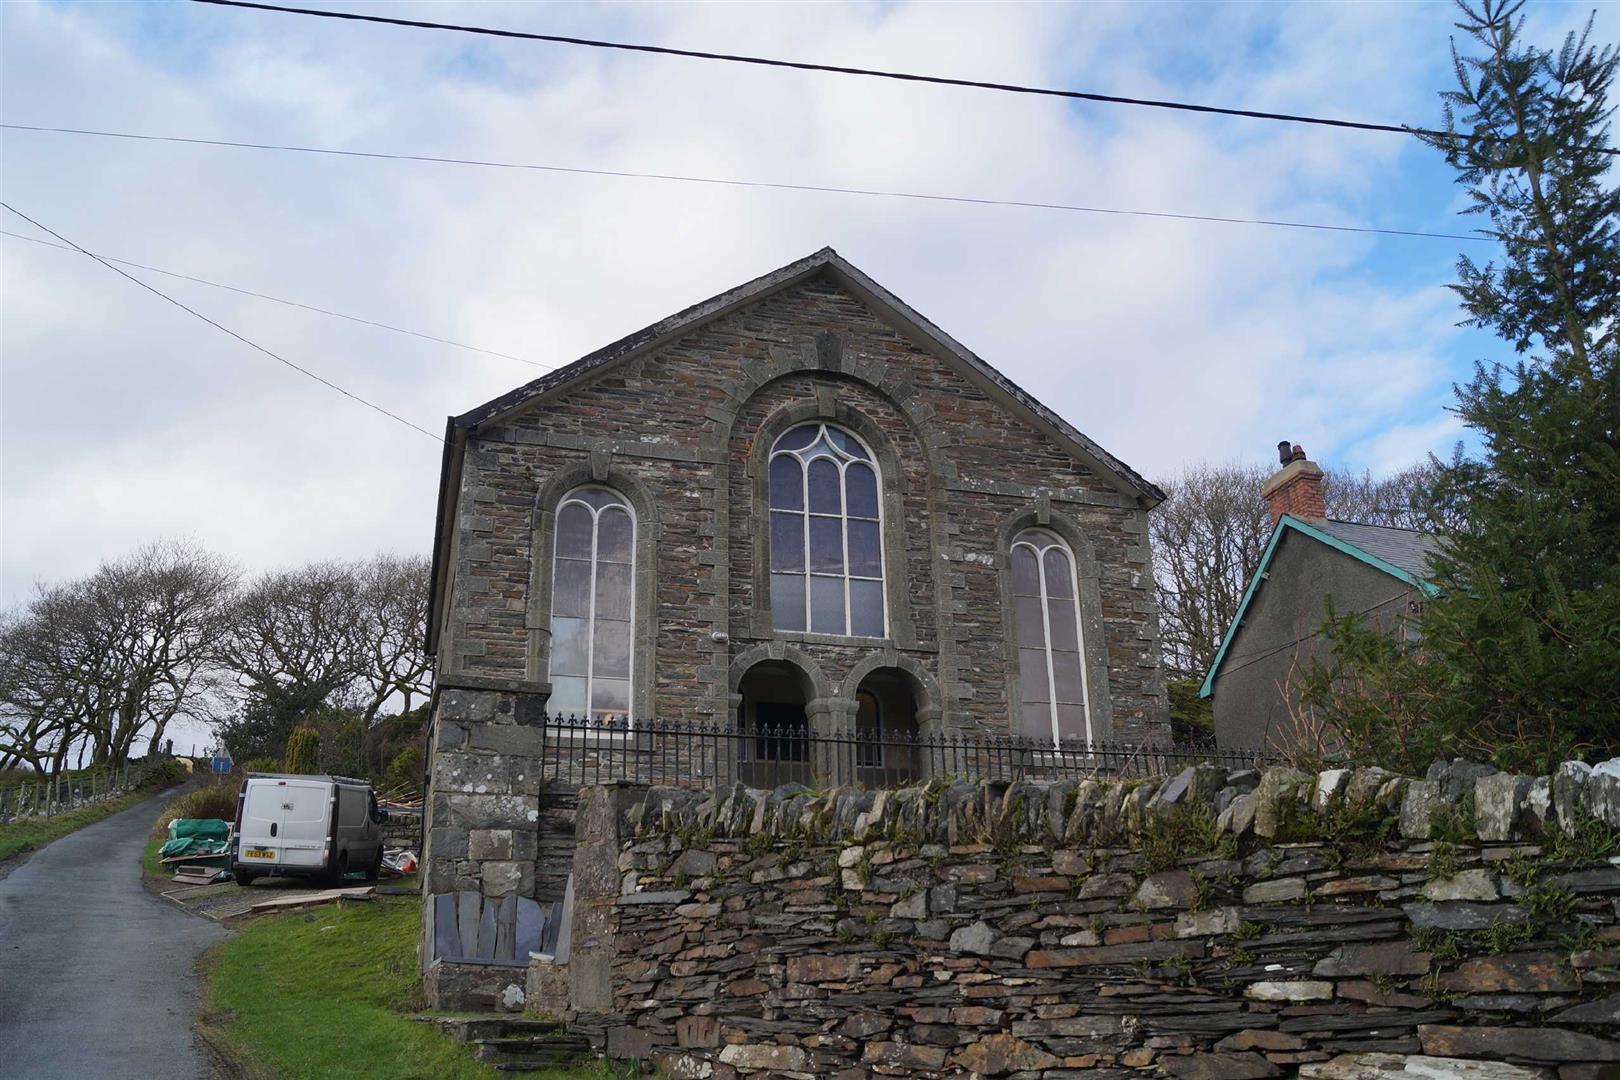 Llanfrothen - £80,000/Asking price